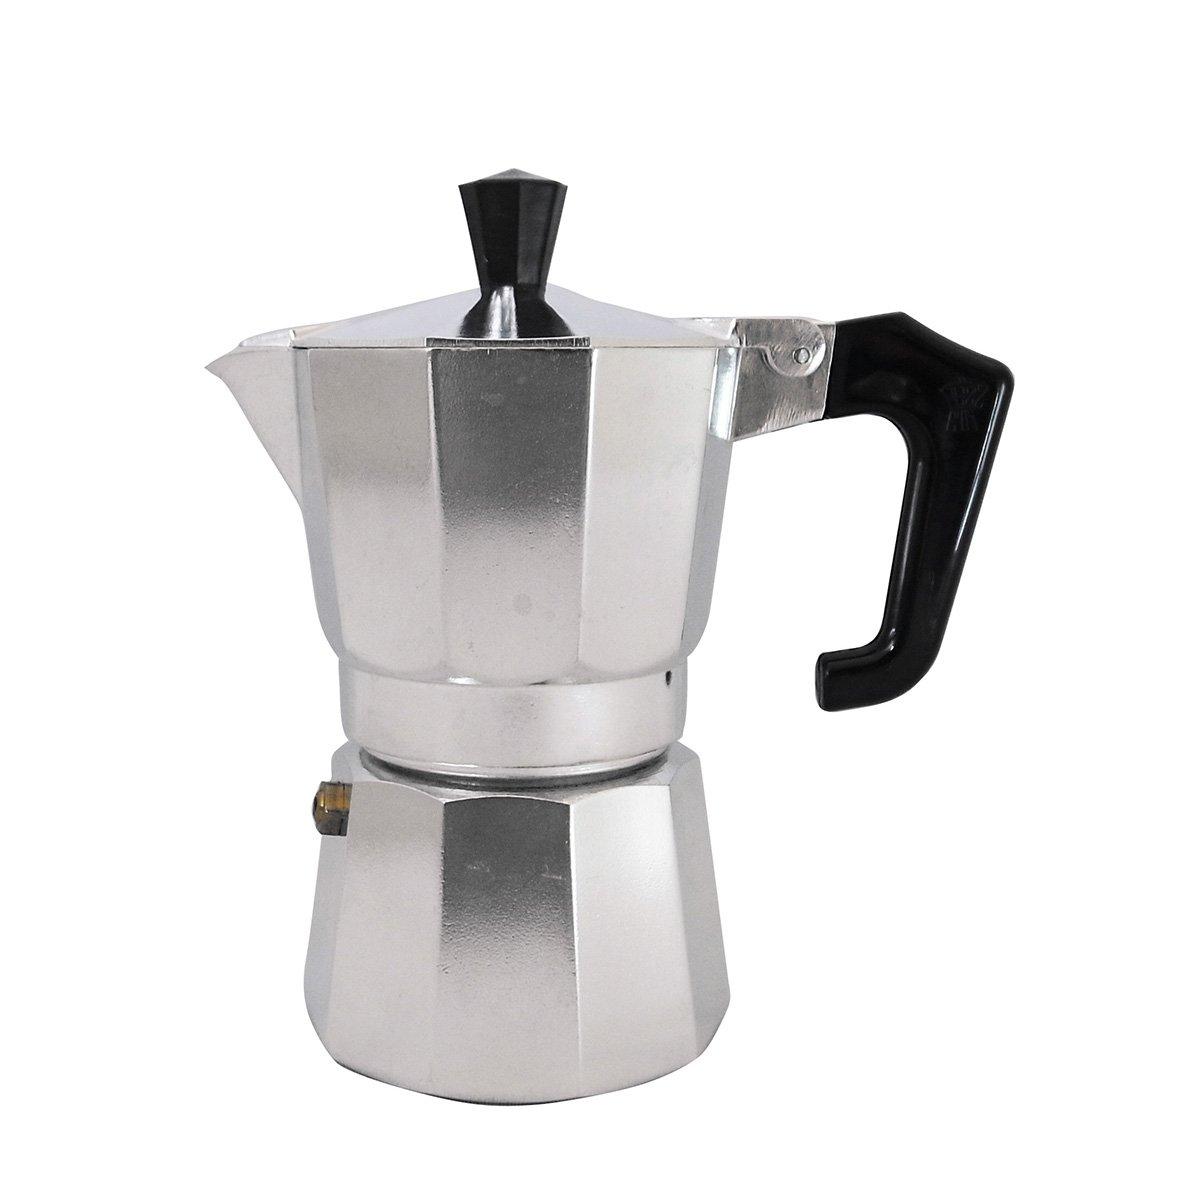 Pezzetti Stove-Top Moka Espresso Italian-Made Coffee Maker Moka Pot- 1,2,3,6,9,14 Cup (2 Cup) by Pezzetti